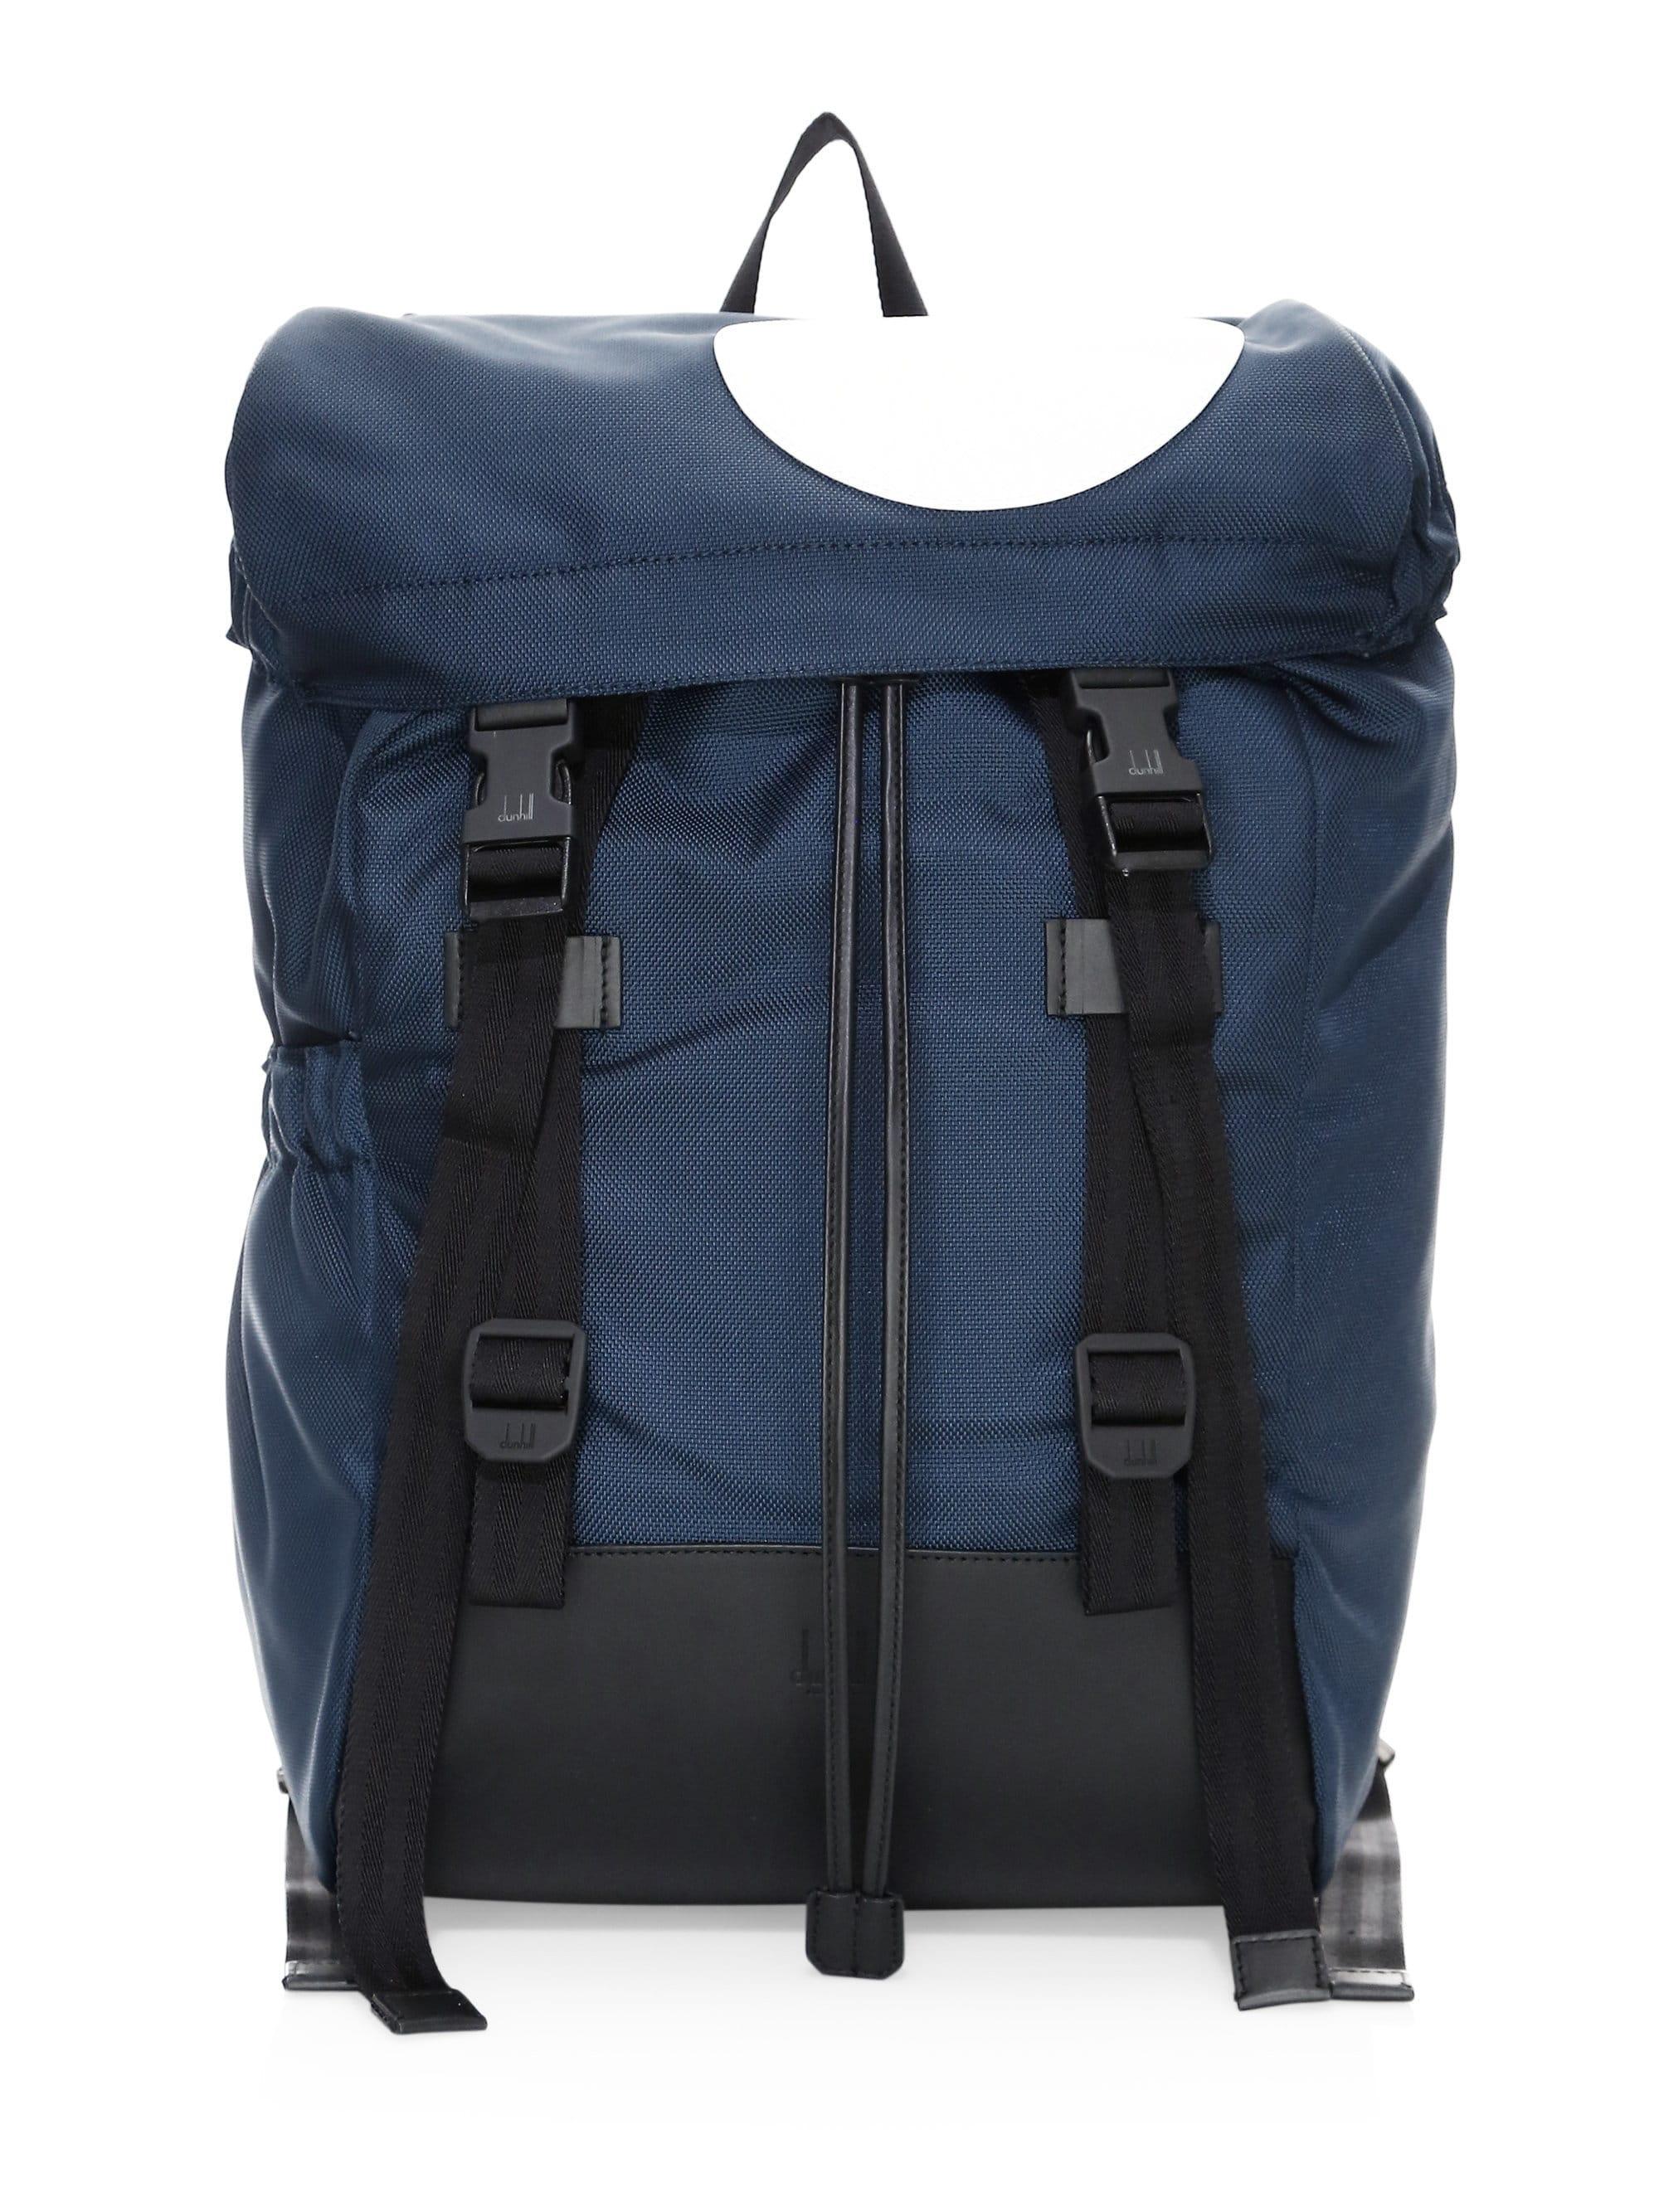 Lyst - Dunhill Men s Radial Large Backpack - Navy in Blue for Men 65c5ca553cec3